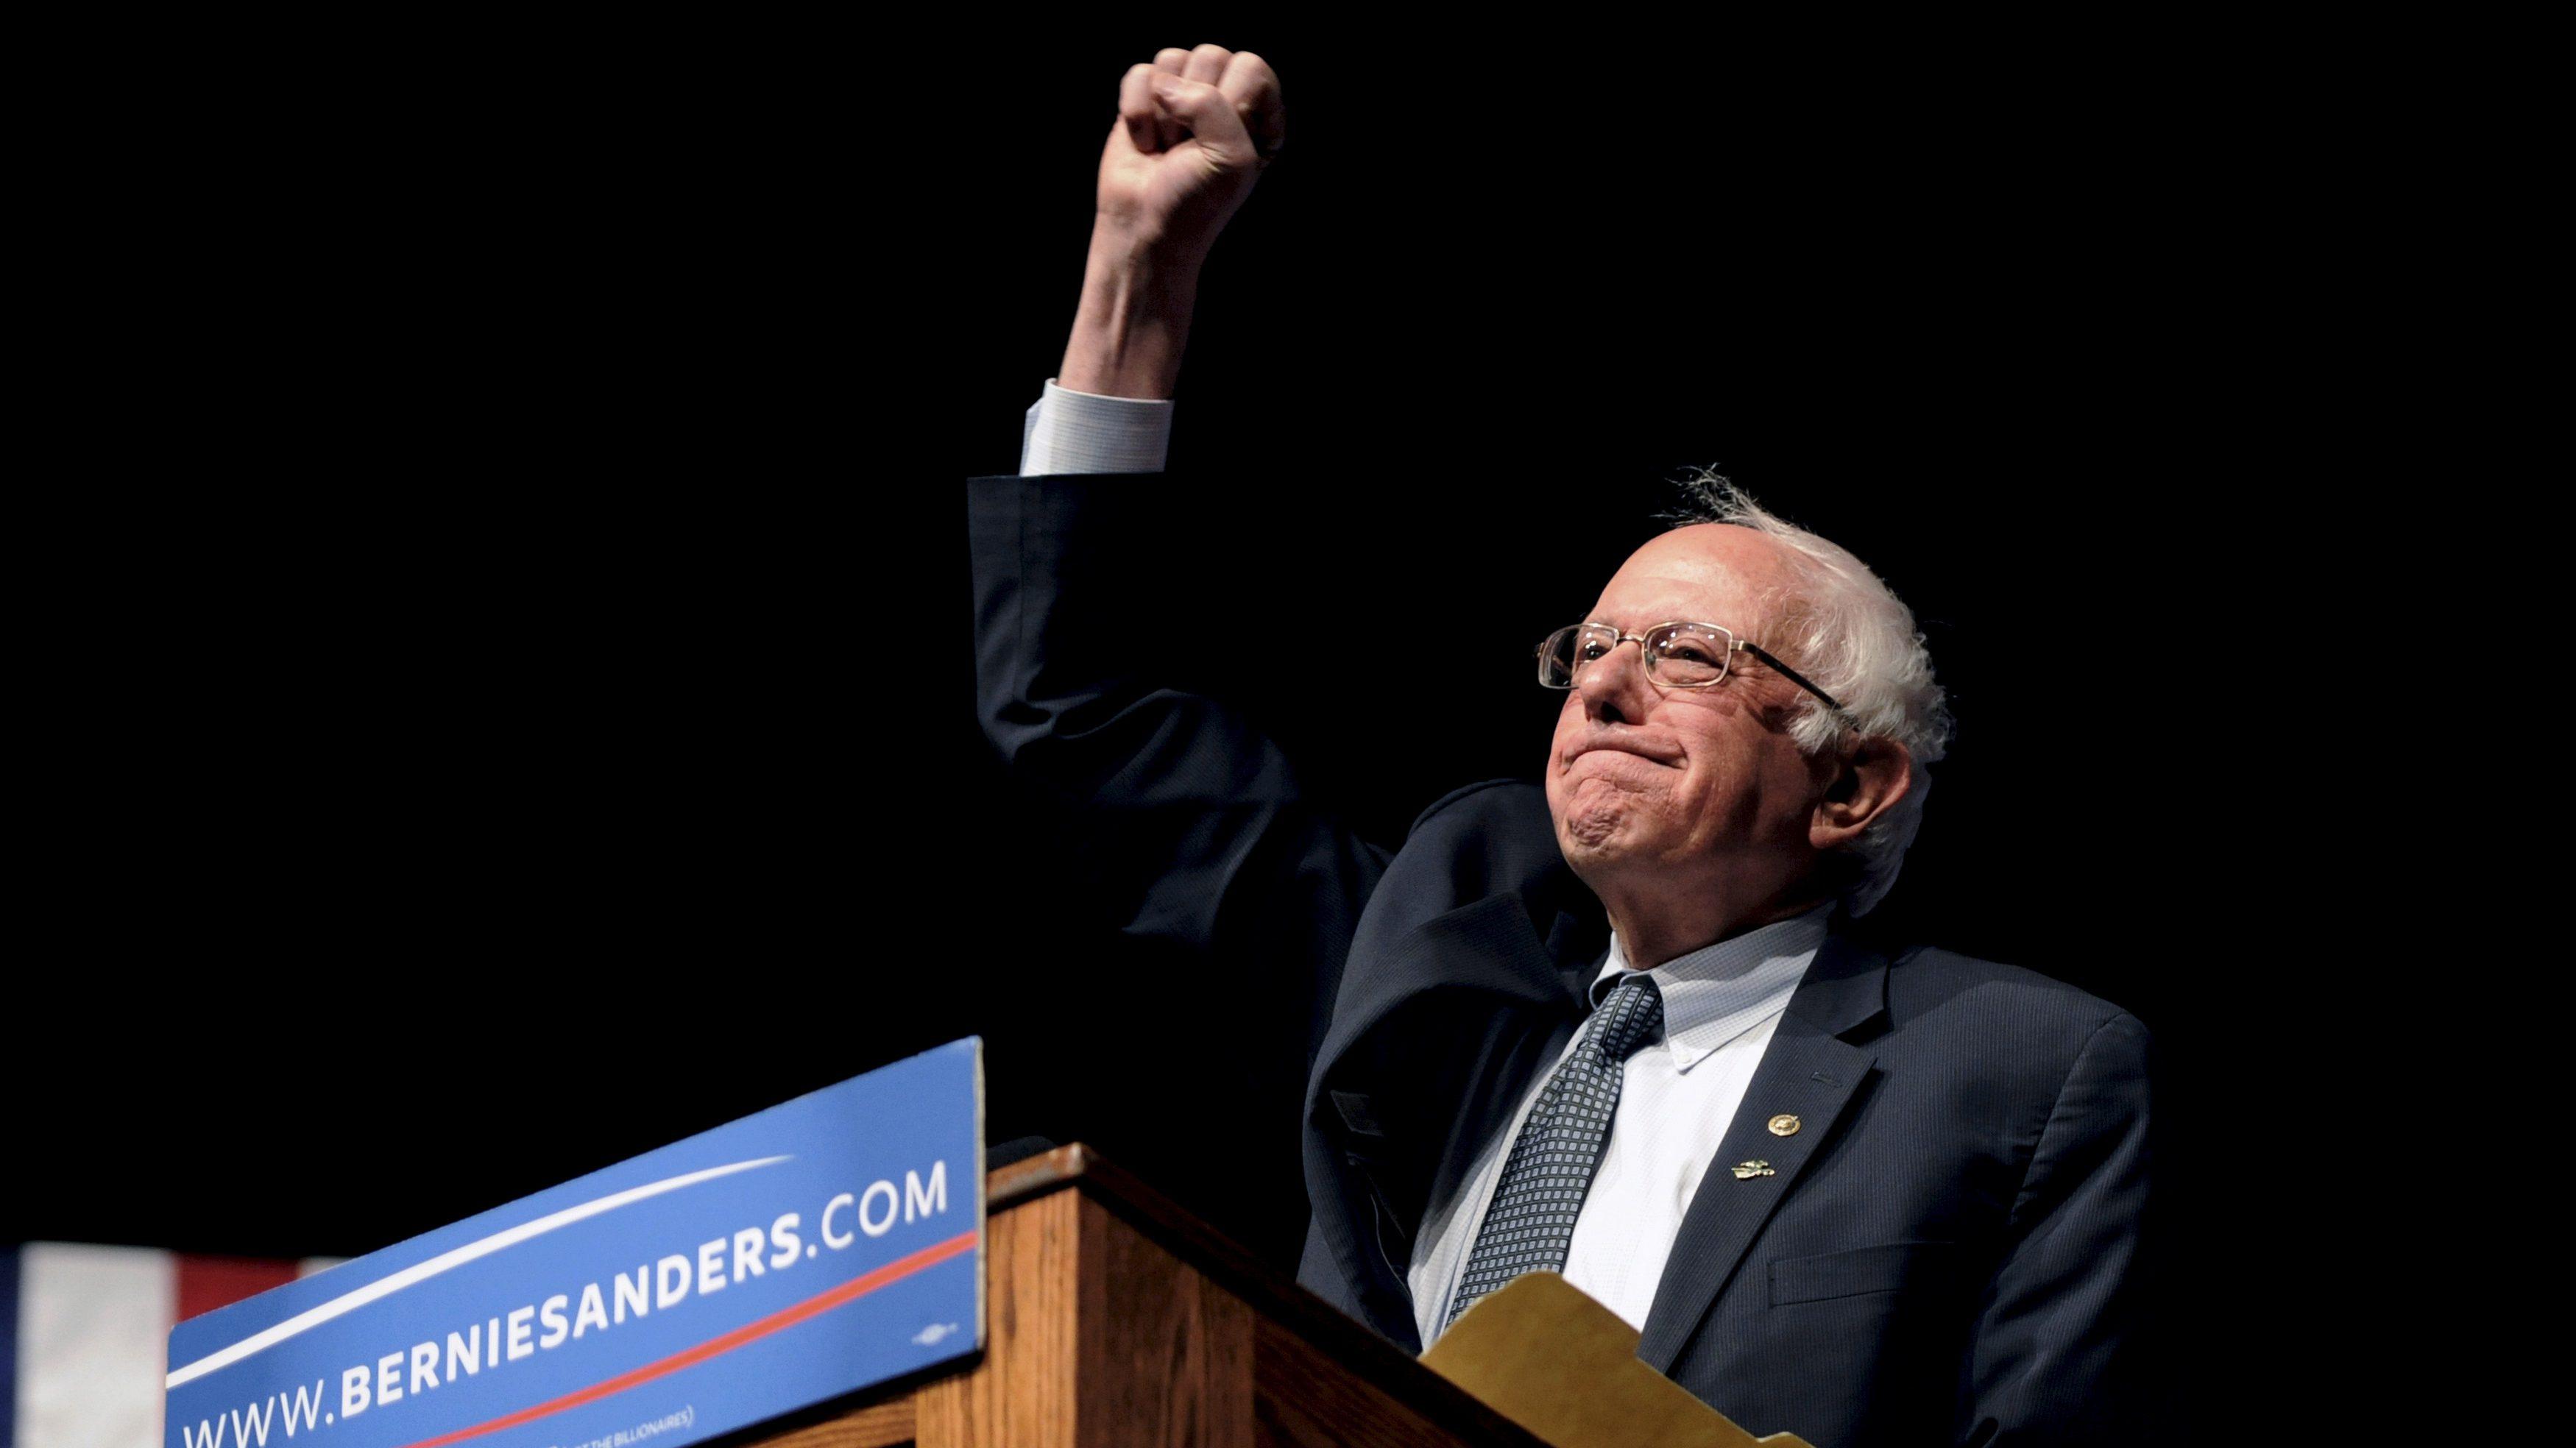 Vermont Rep. Bernie Sanders